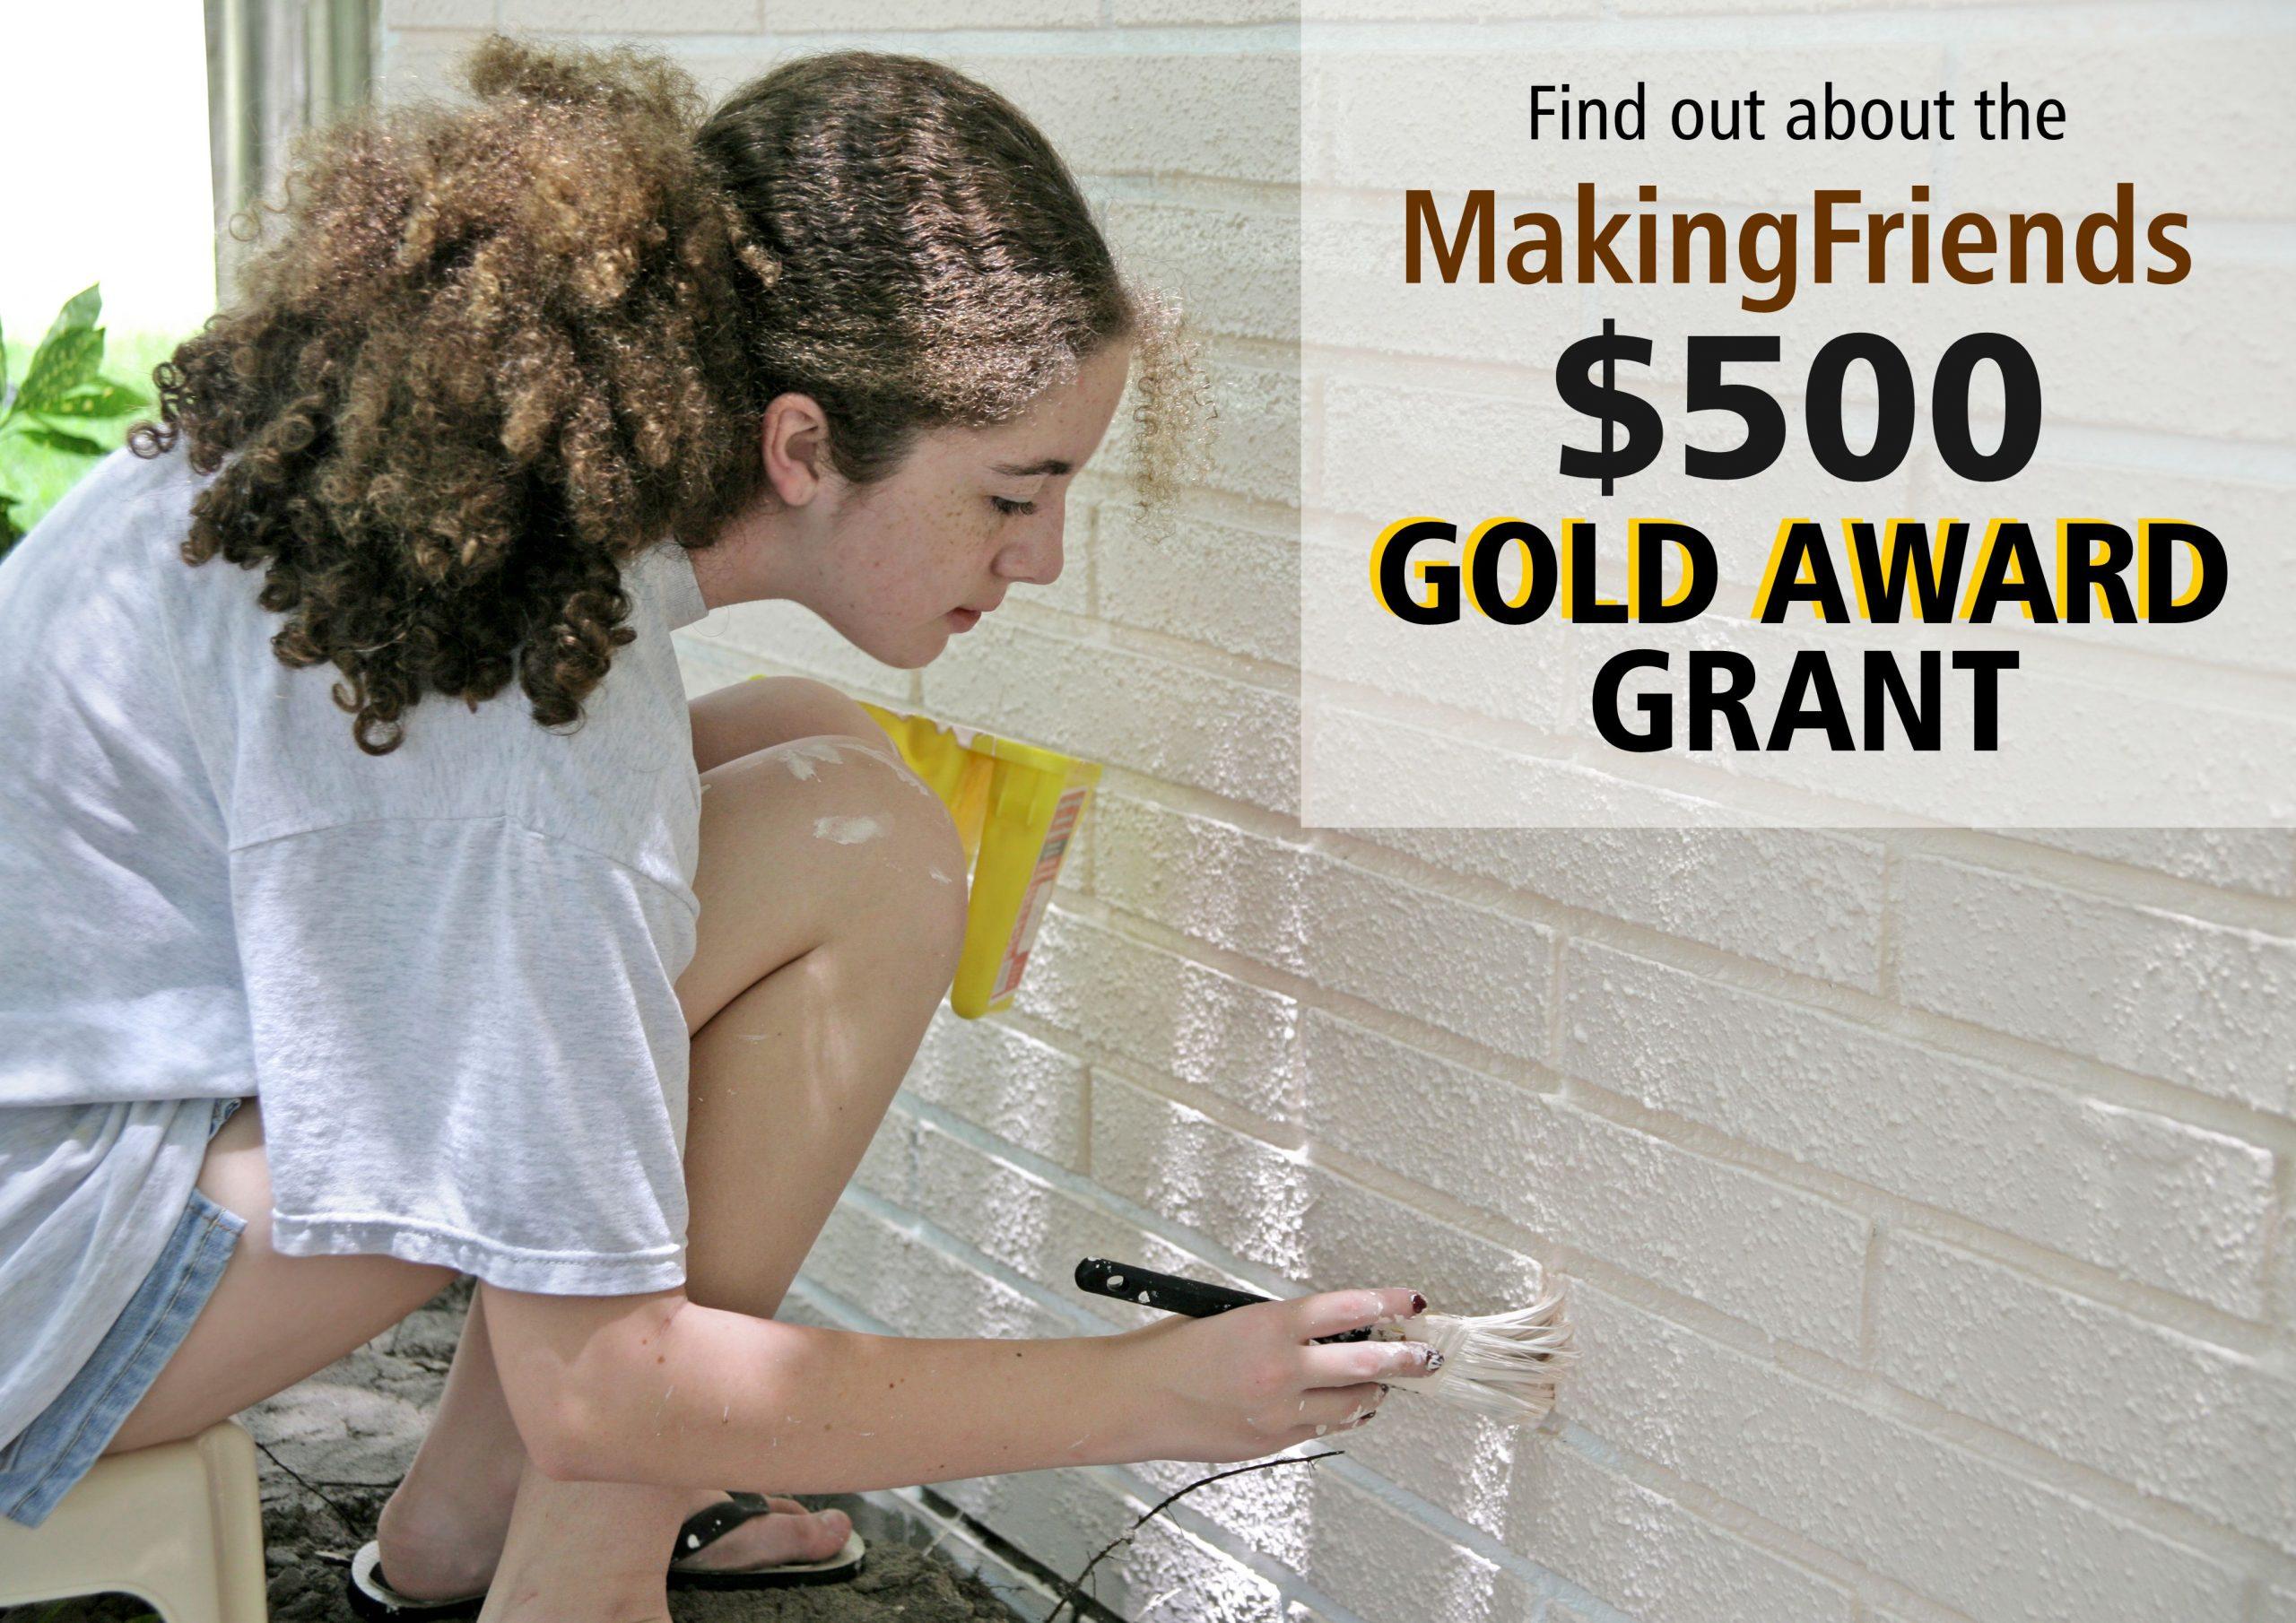 MakingFriends Gold Award Grant